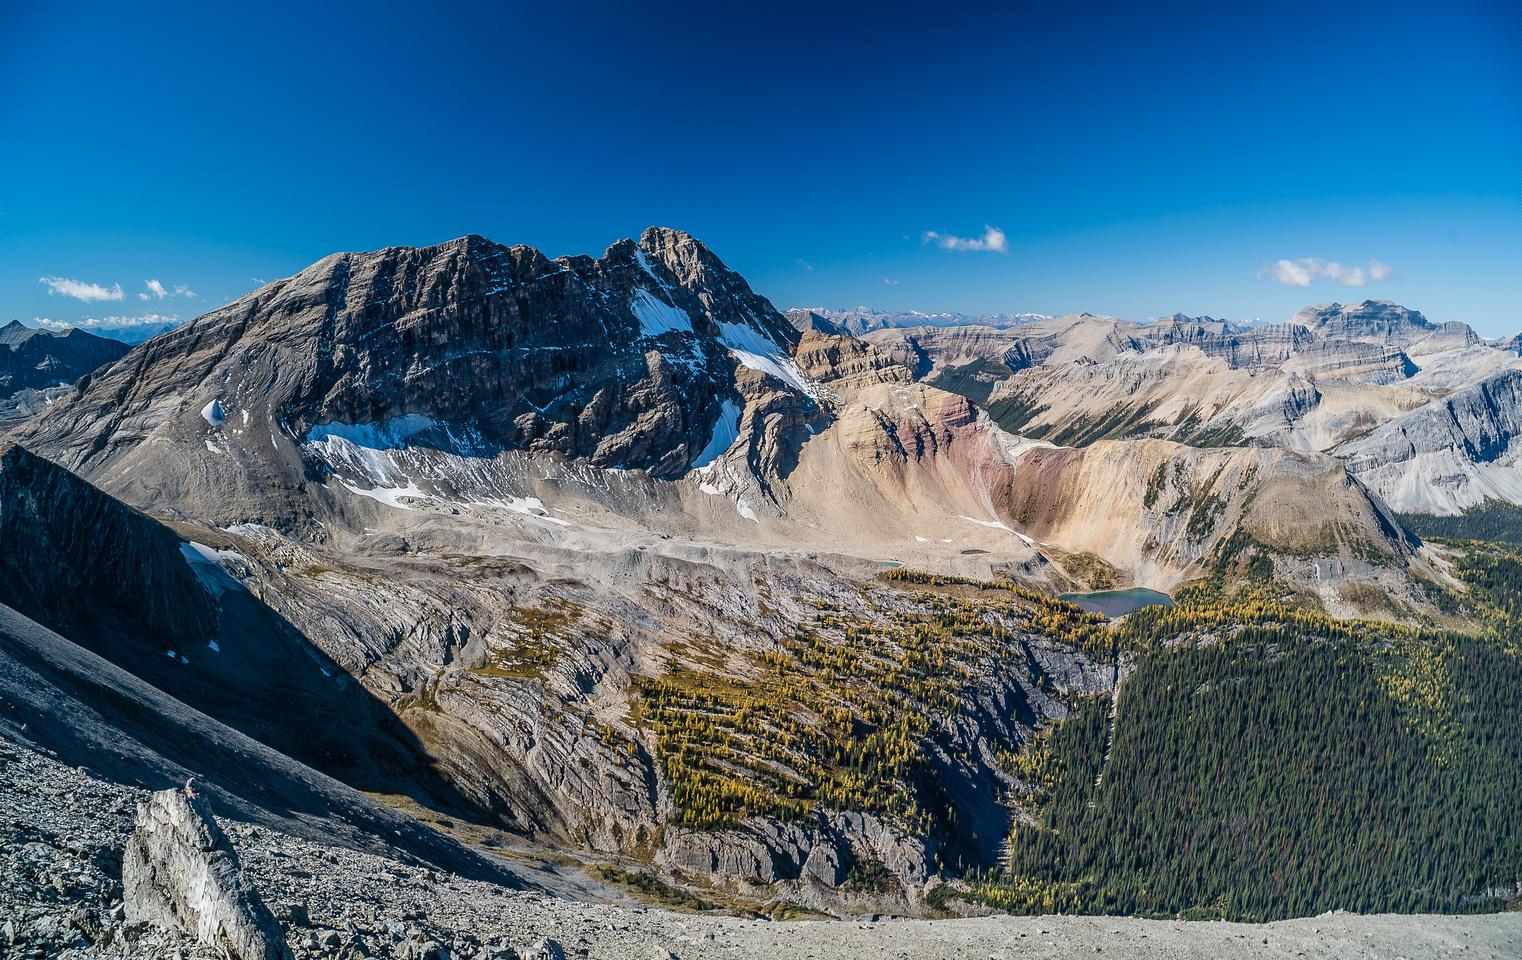 Views towards White Man Mountain and its tarn.